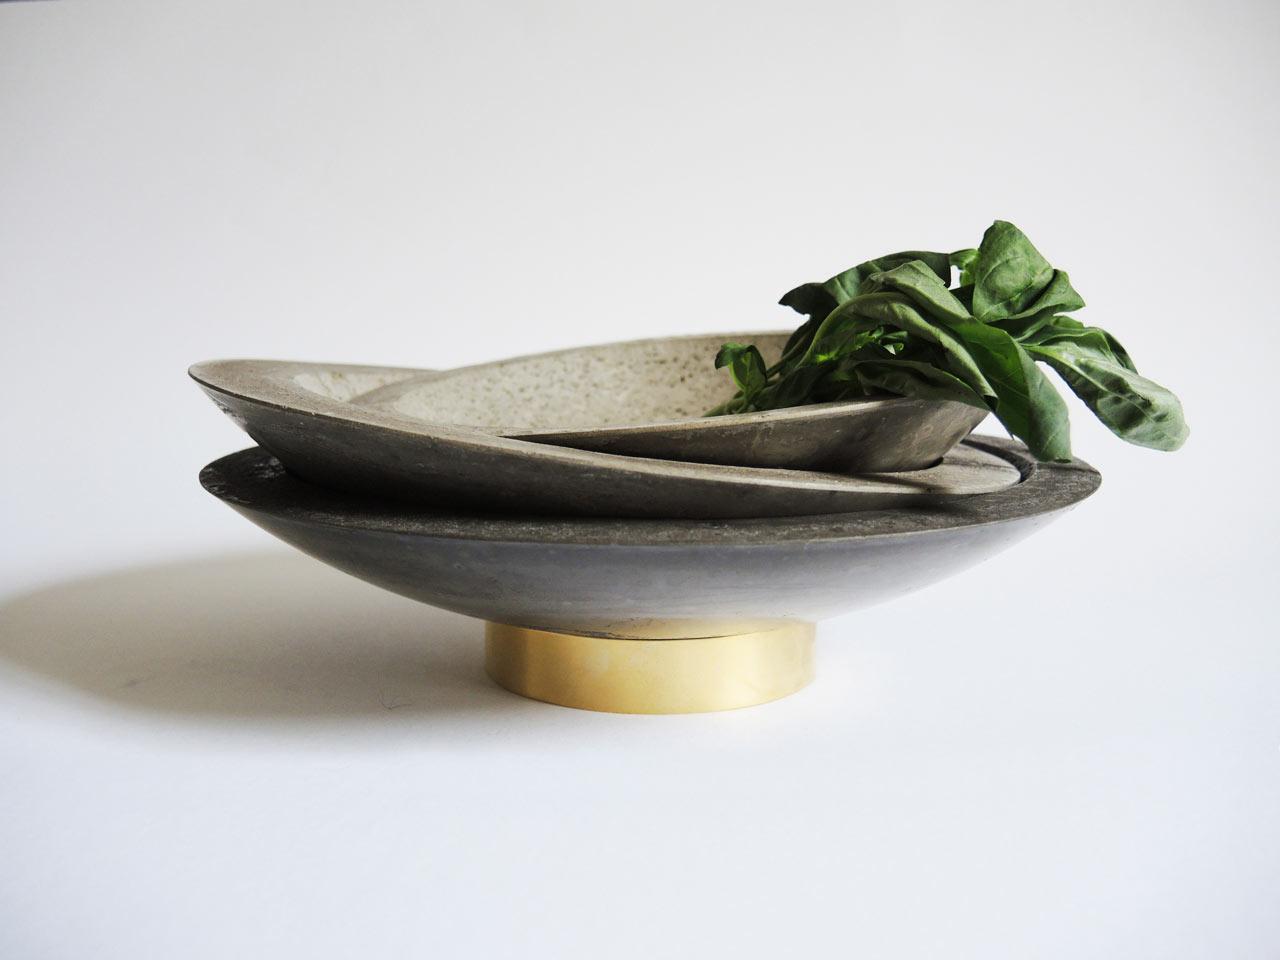 concrete-stacking-bowls